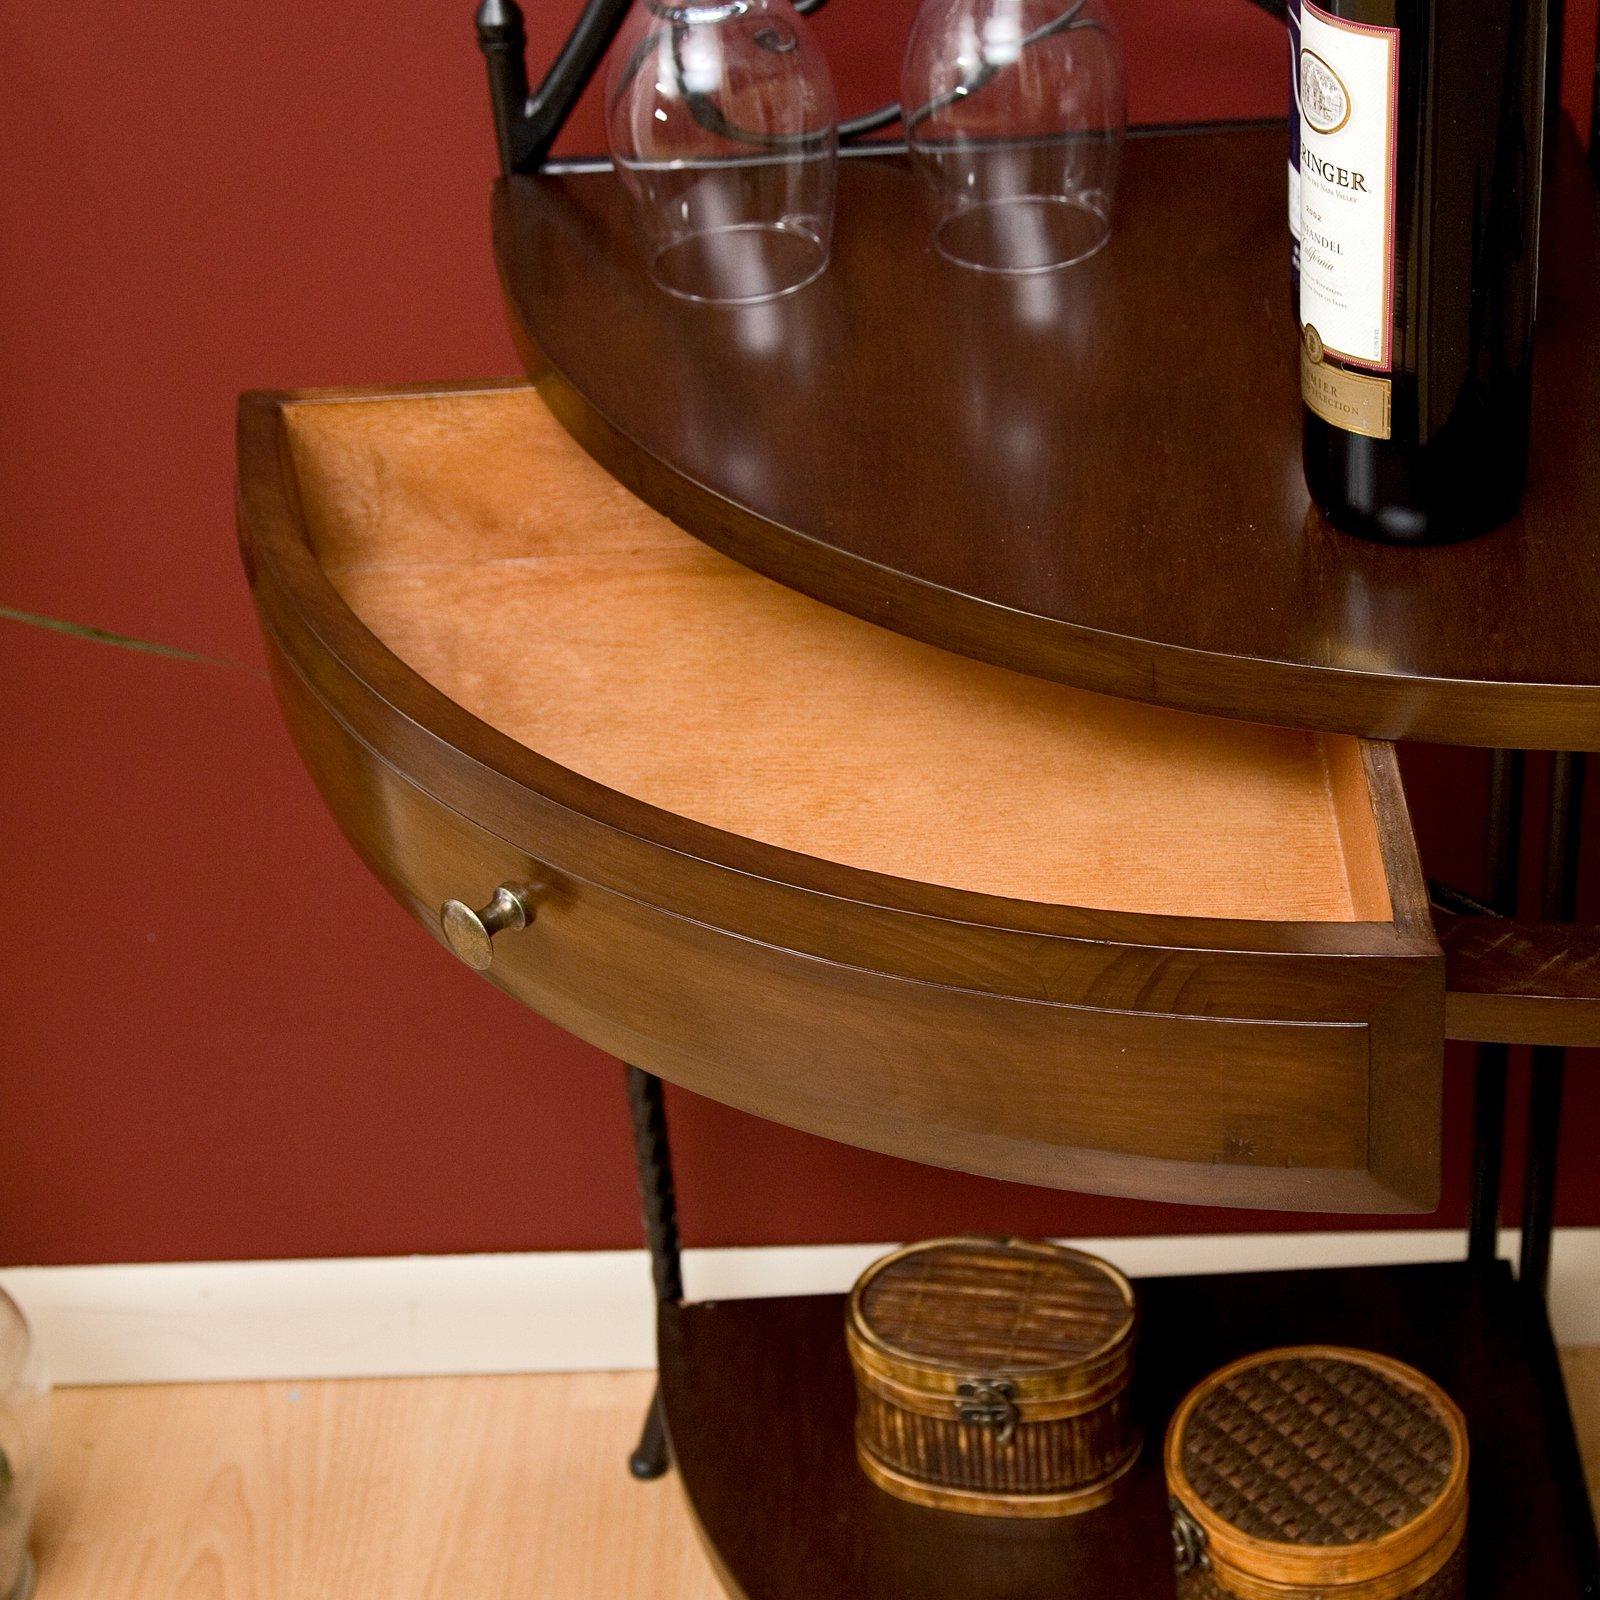 Wrought Iron Corner Bakers Rack with Wood Shelves, Heritage Oak Finish by Belham Living (Image #4)